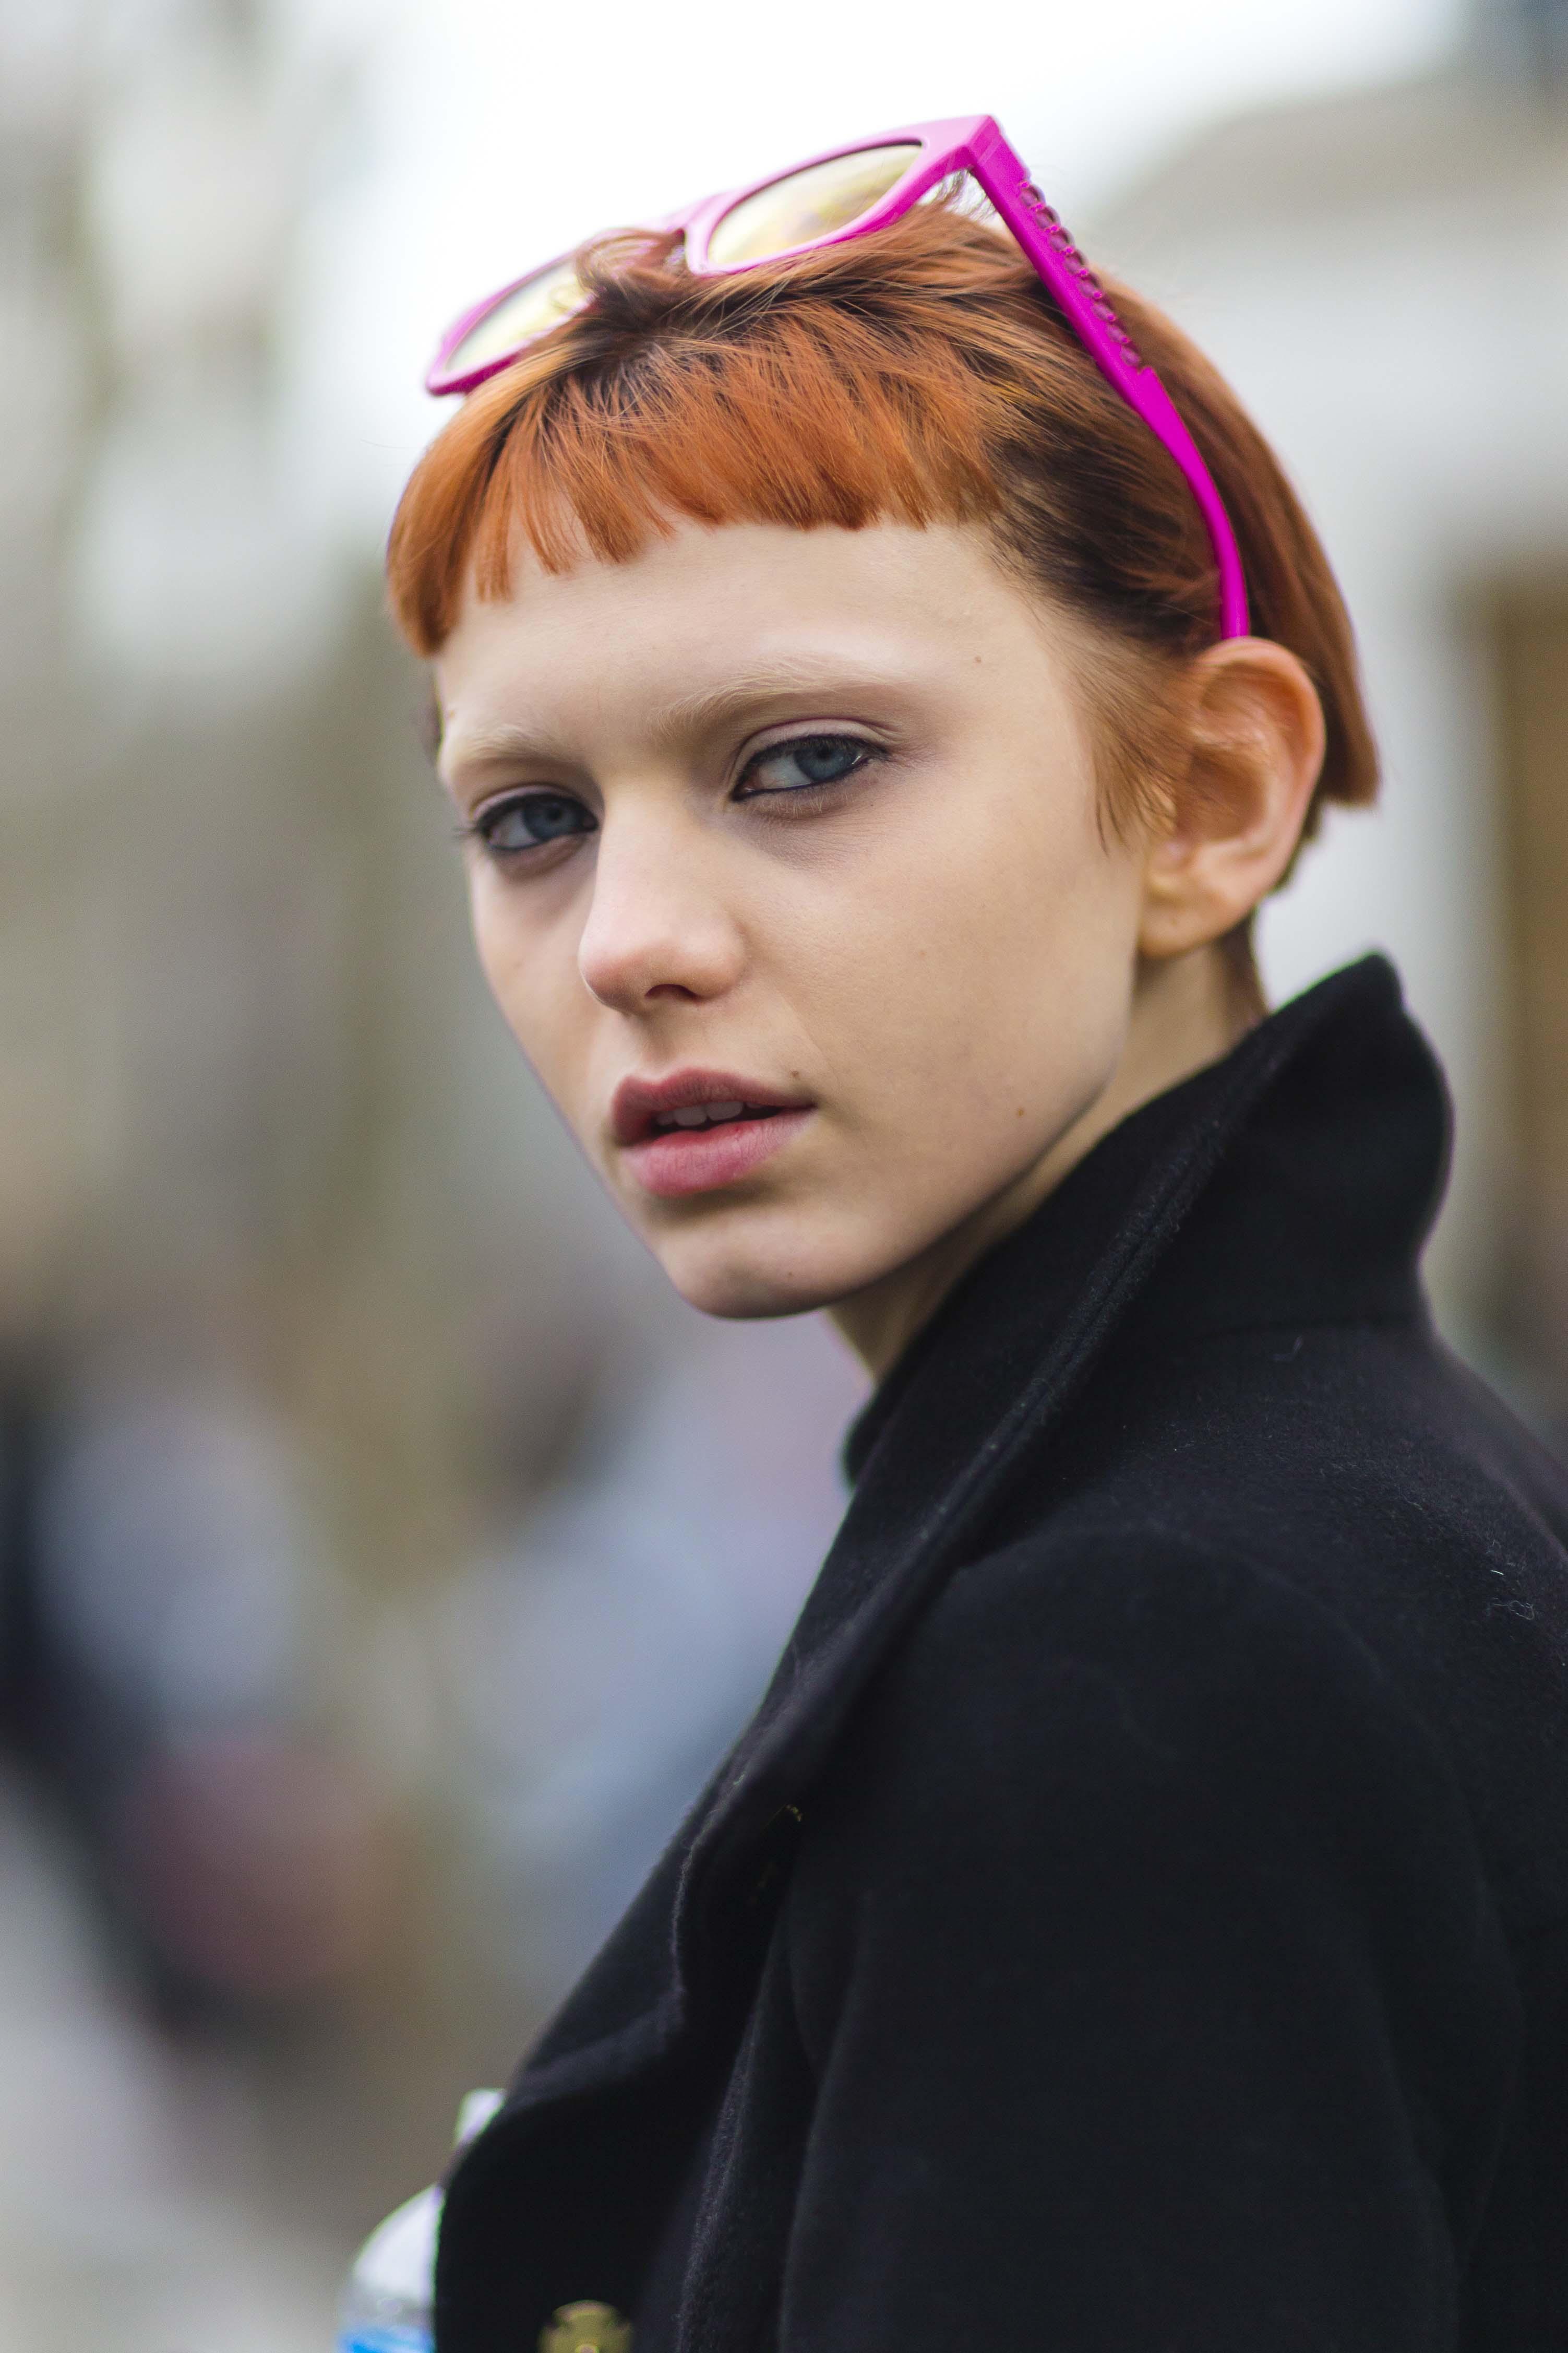 temporary hair color orange hair